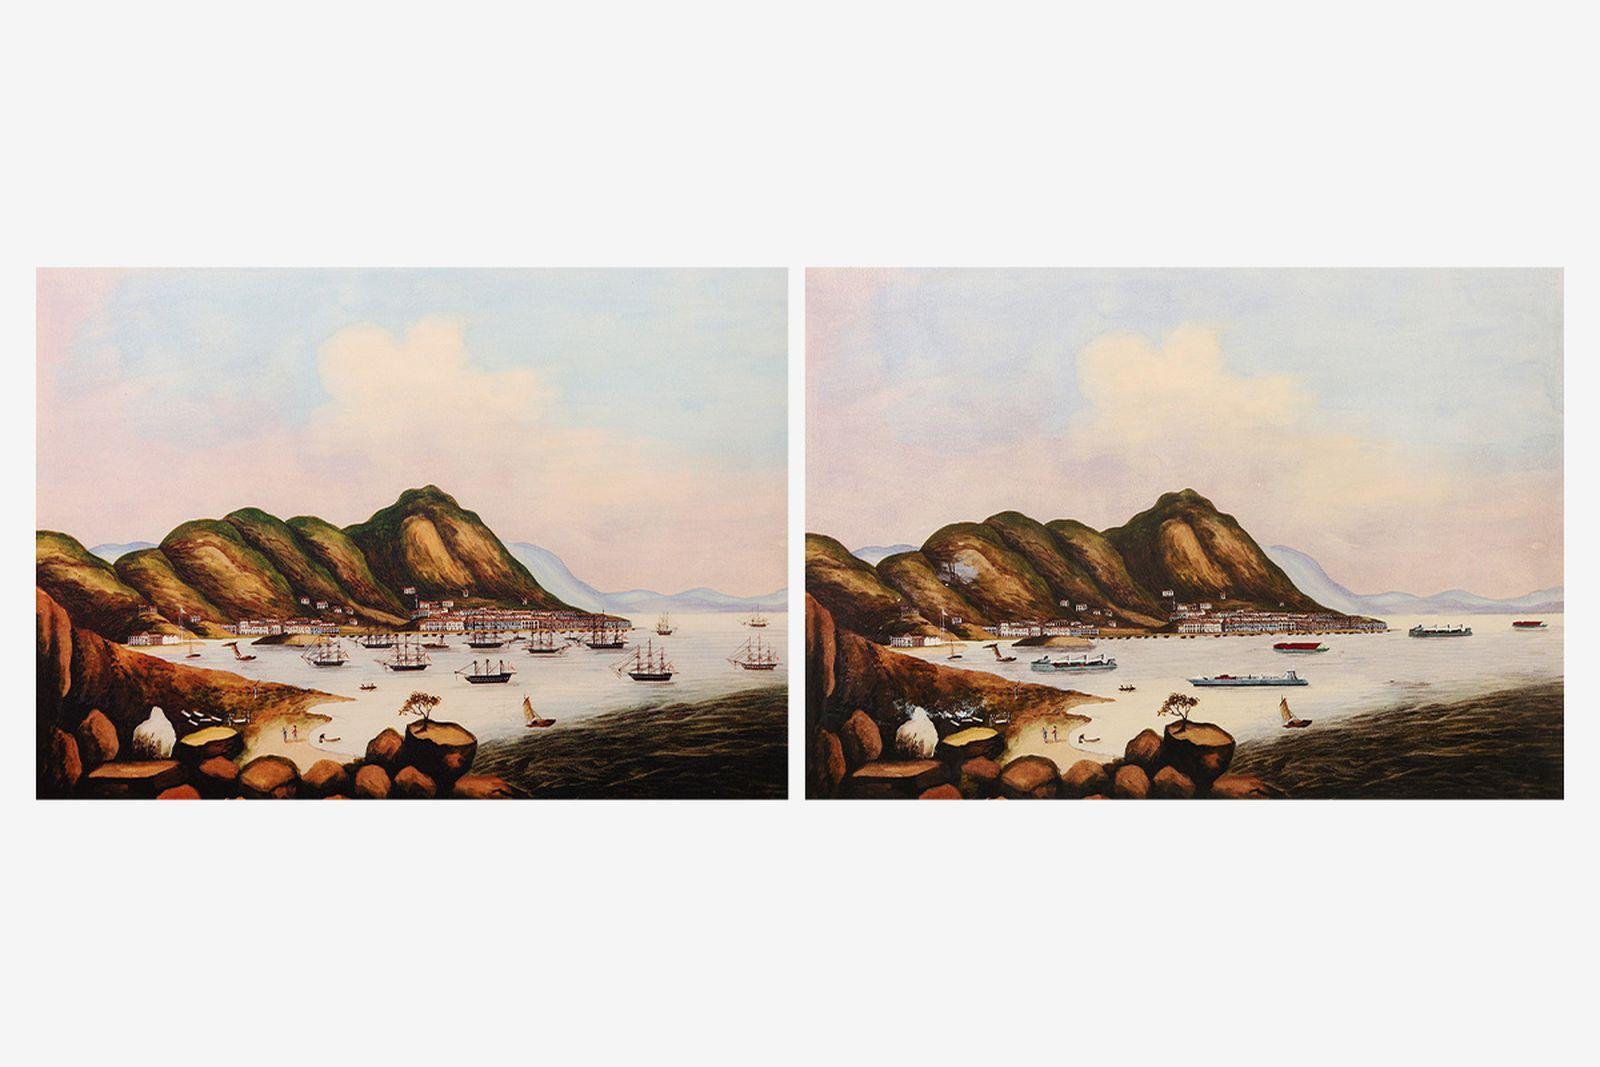 reuben-dangoor-taps-the-great-masters-to-imagine-future-seascapes-06